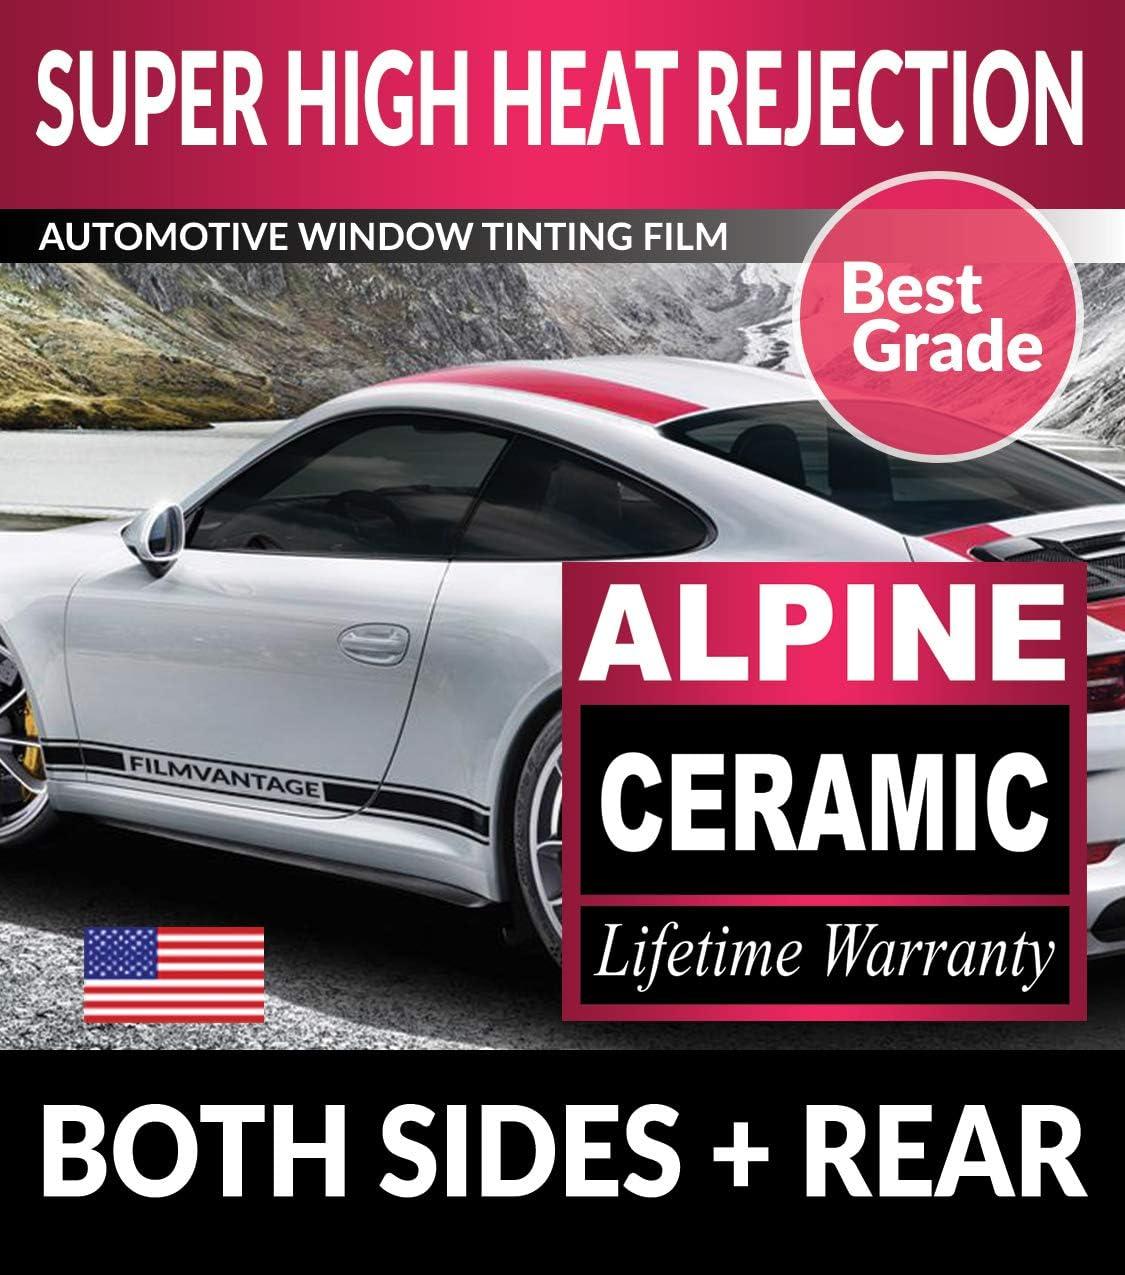 Super High Heat Rejection Alpine Precut Window Tint for Alfa Romeo Giulia 2017 2018 2019 - F70R35